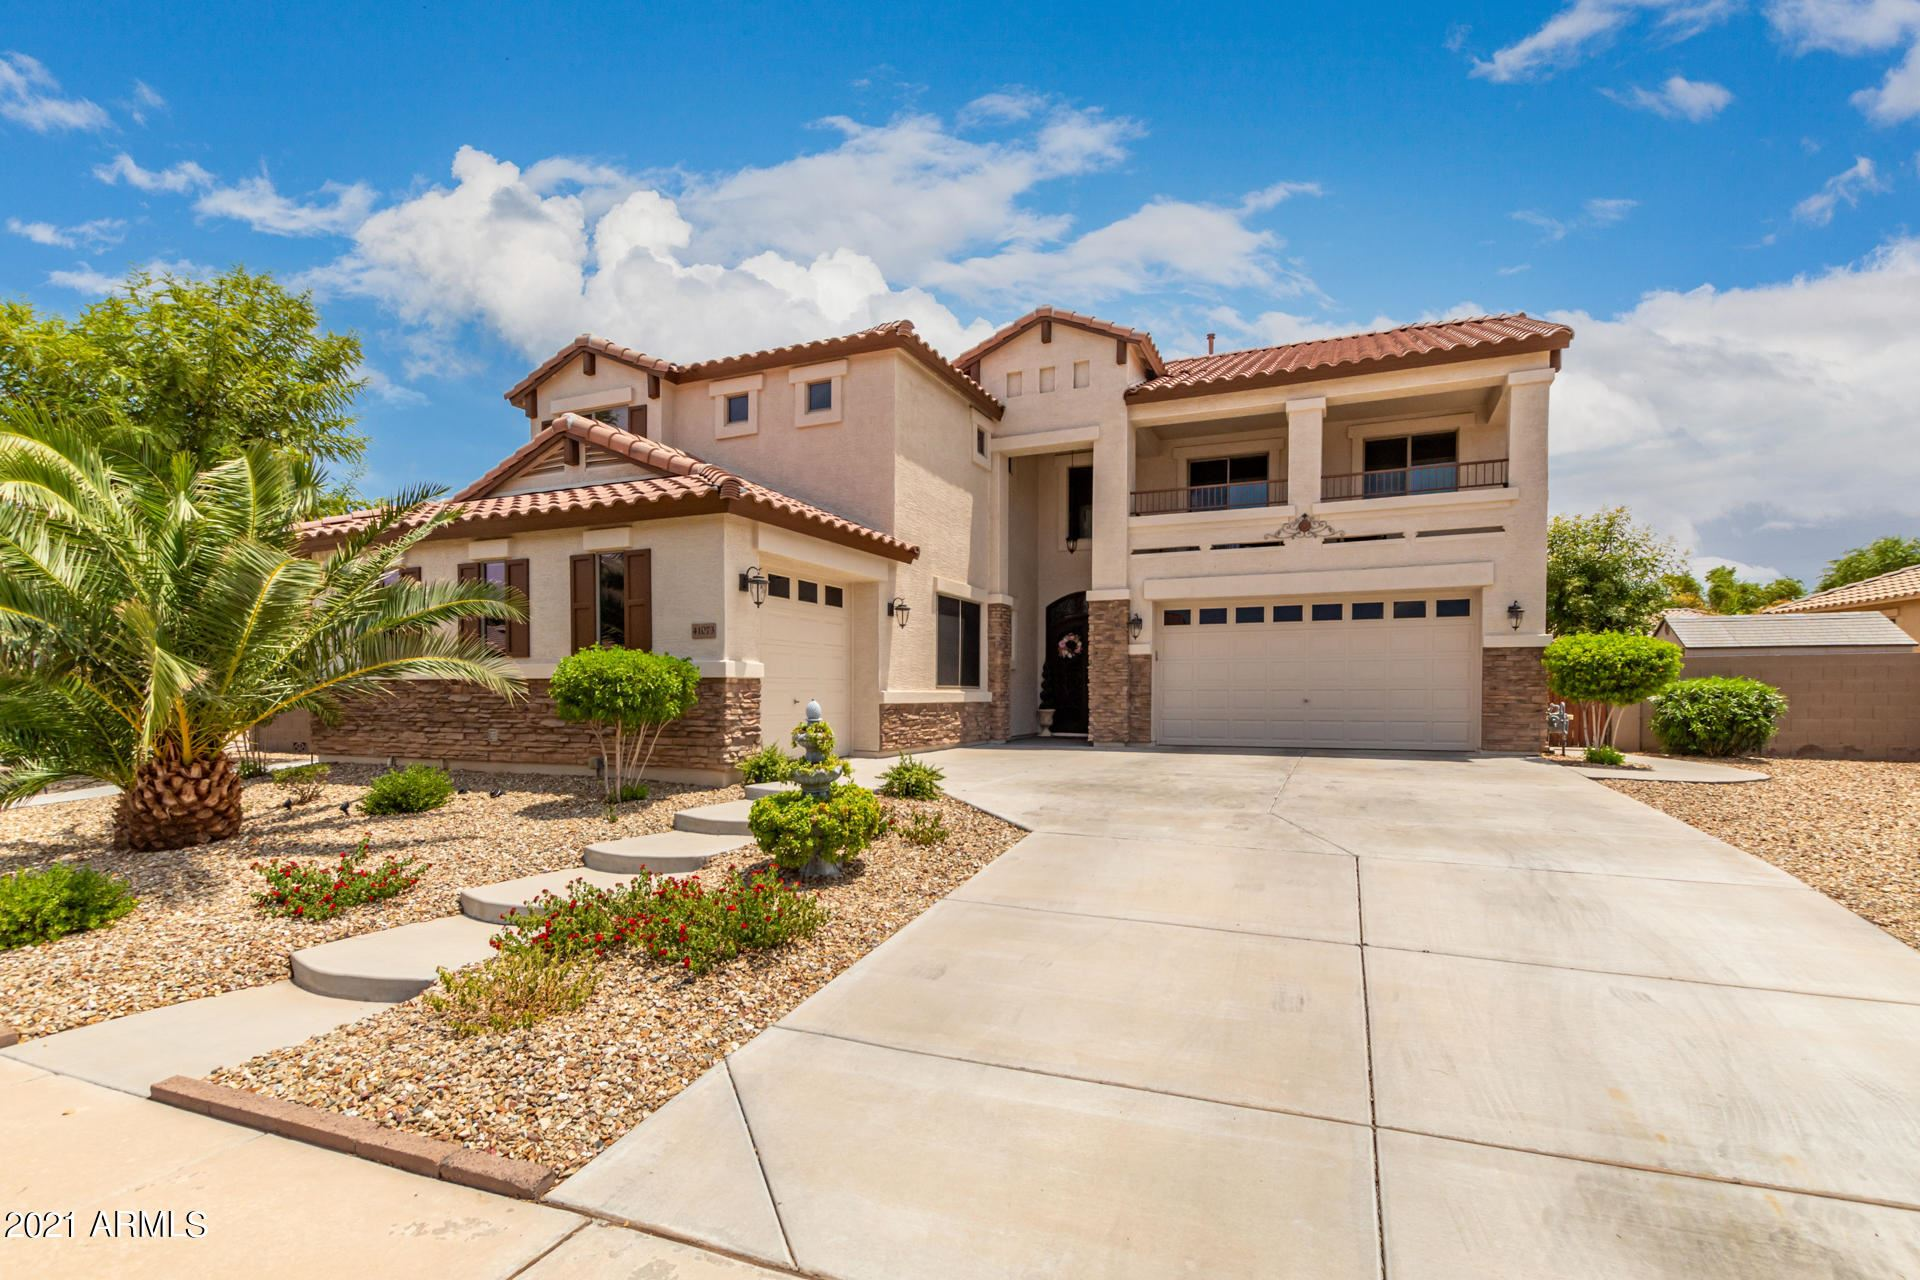 41073 W HOPPER Drive, Maricopa, AZ 85138 - MLS#: 6267929